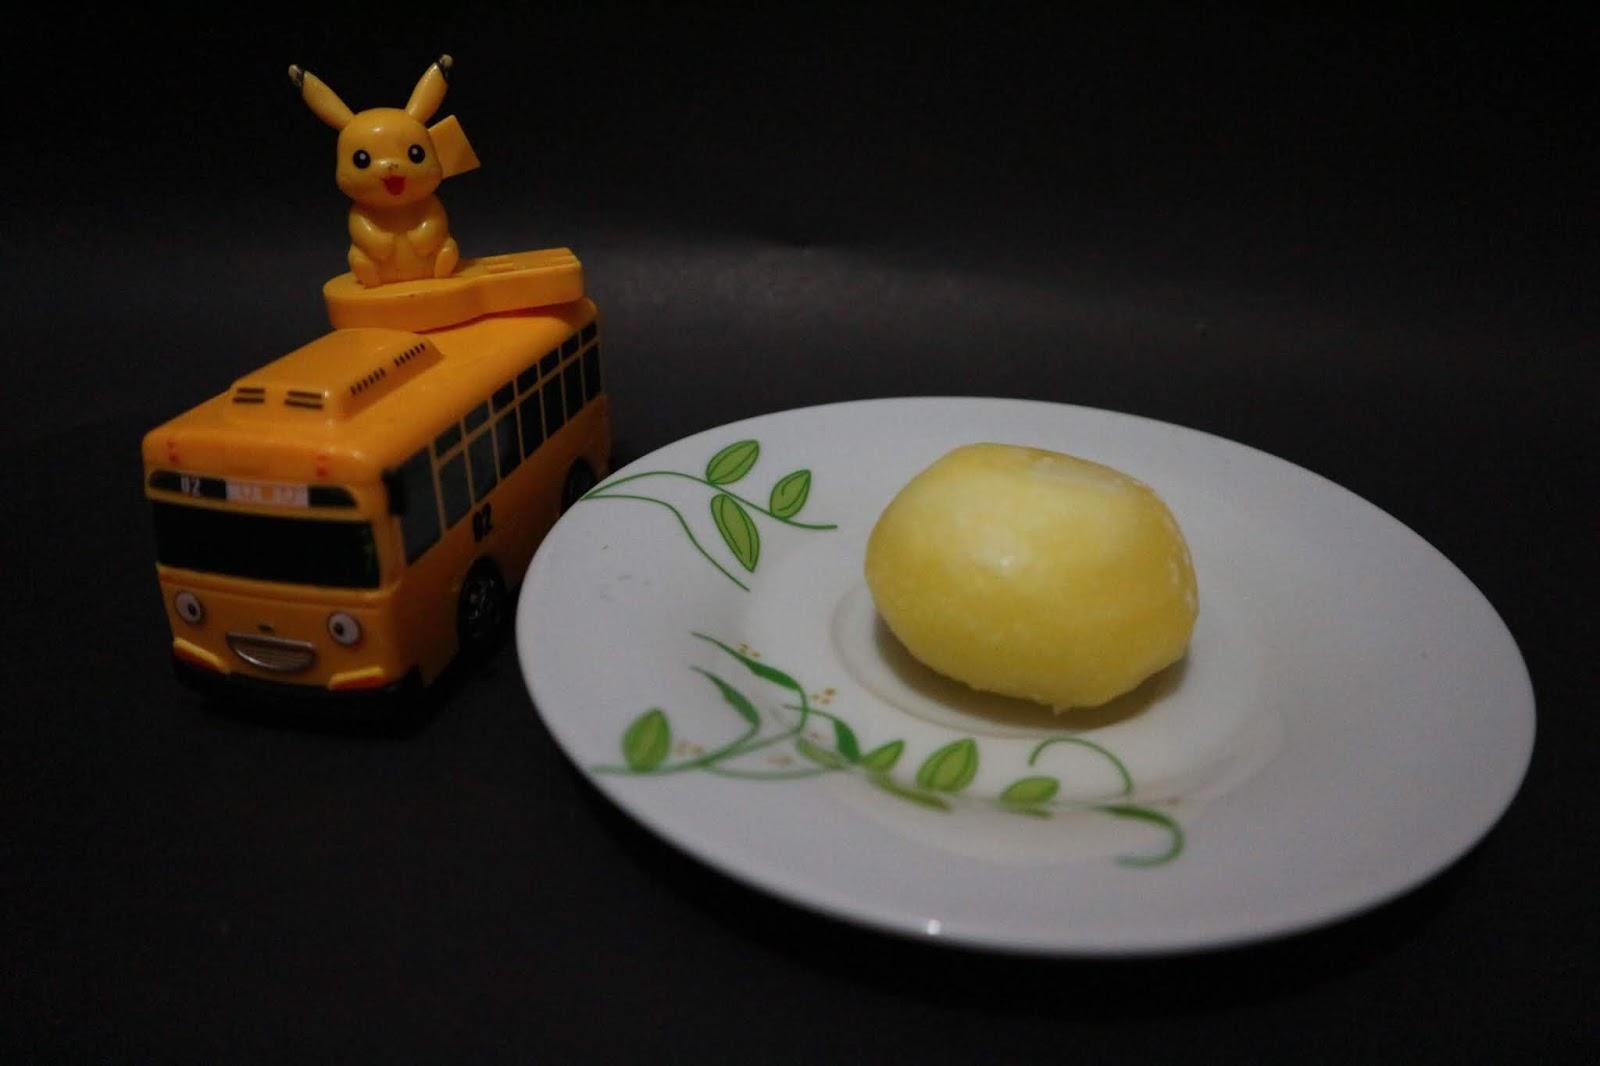 Menu Buka Puasa Praktis : Roti Mochi Ice Cream Skippy, review skippy, menu buka puasa anti ribet, menu buka puasa 10 menit jadi